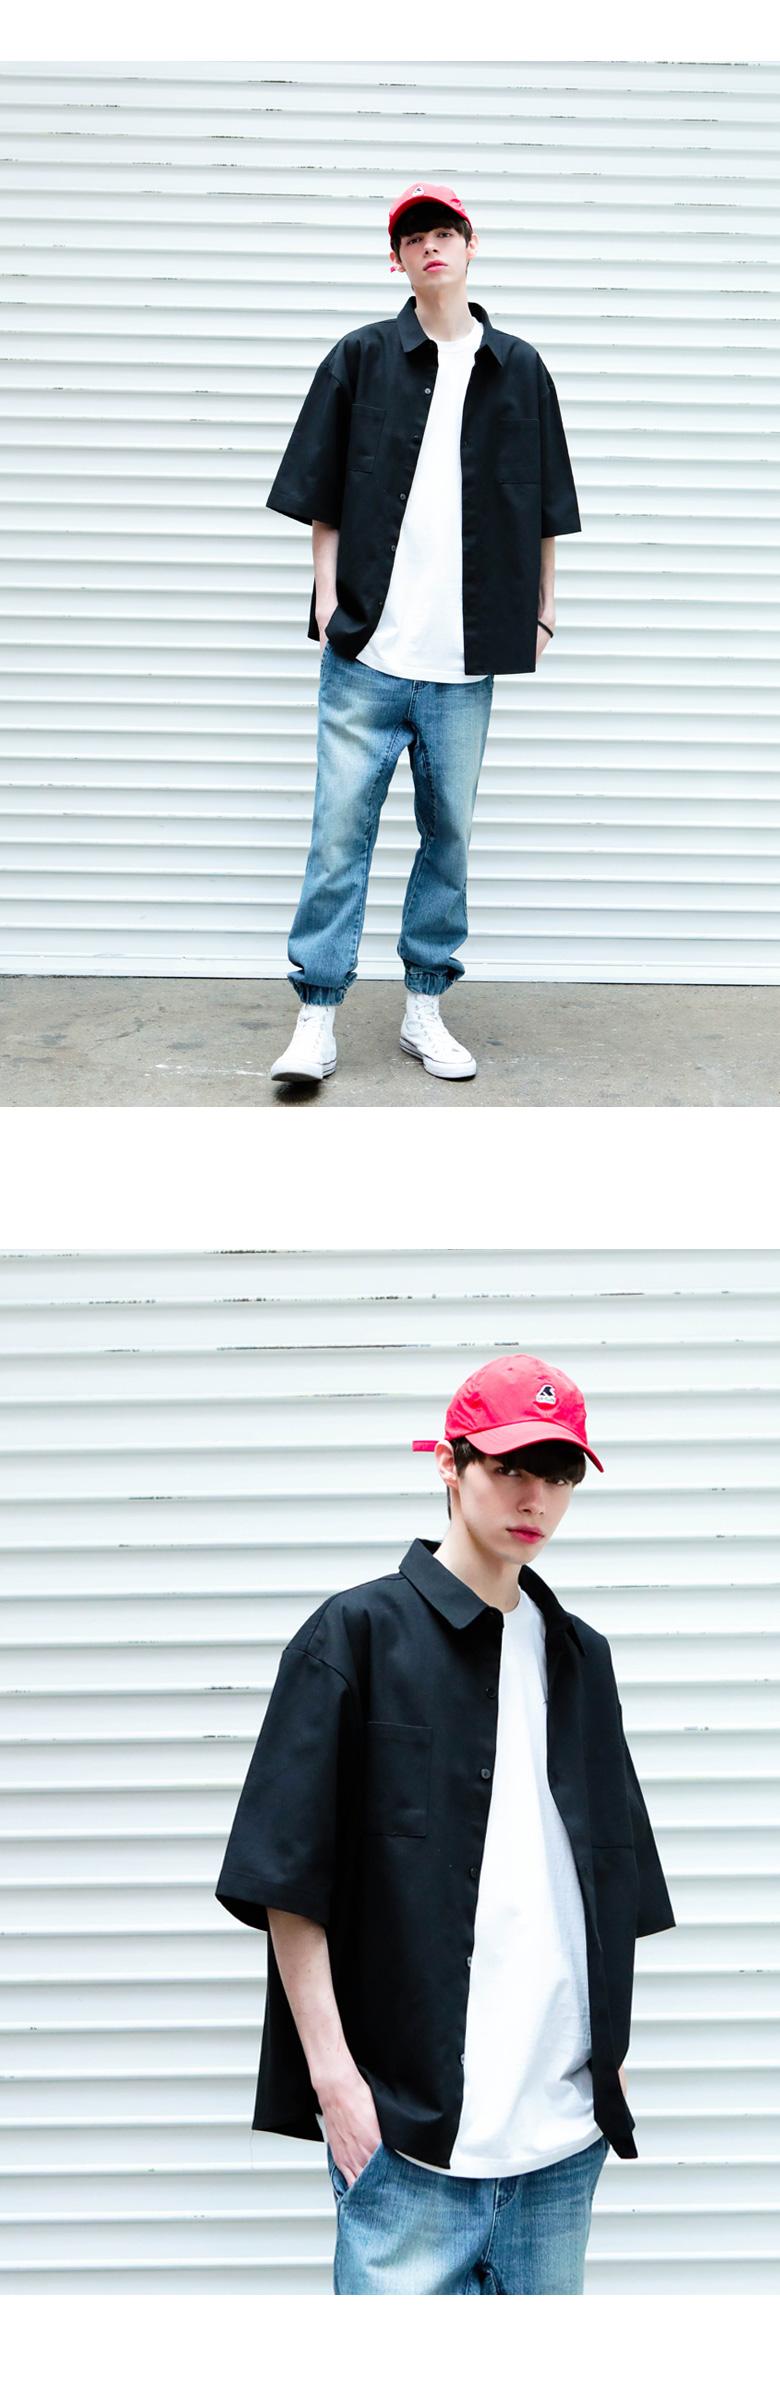 20180415_ps_pigment_short_model_sm_02.jpg